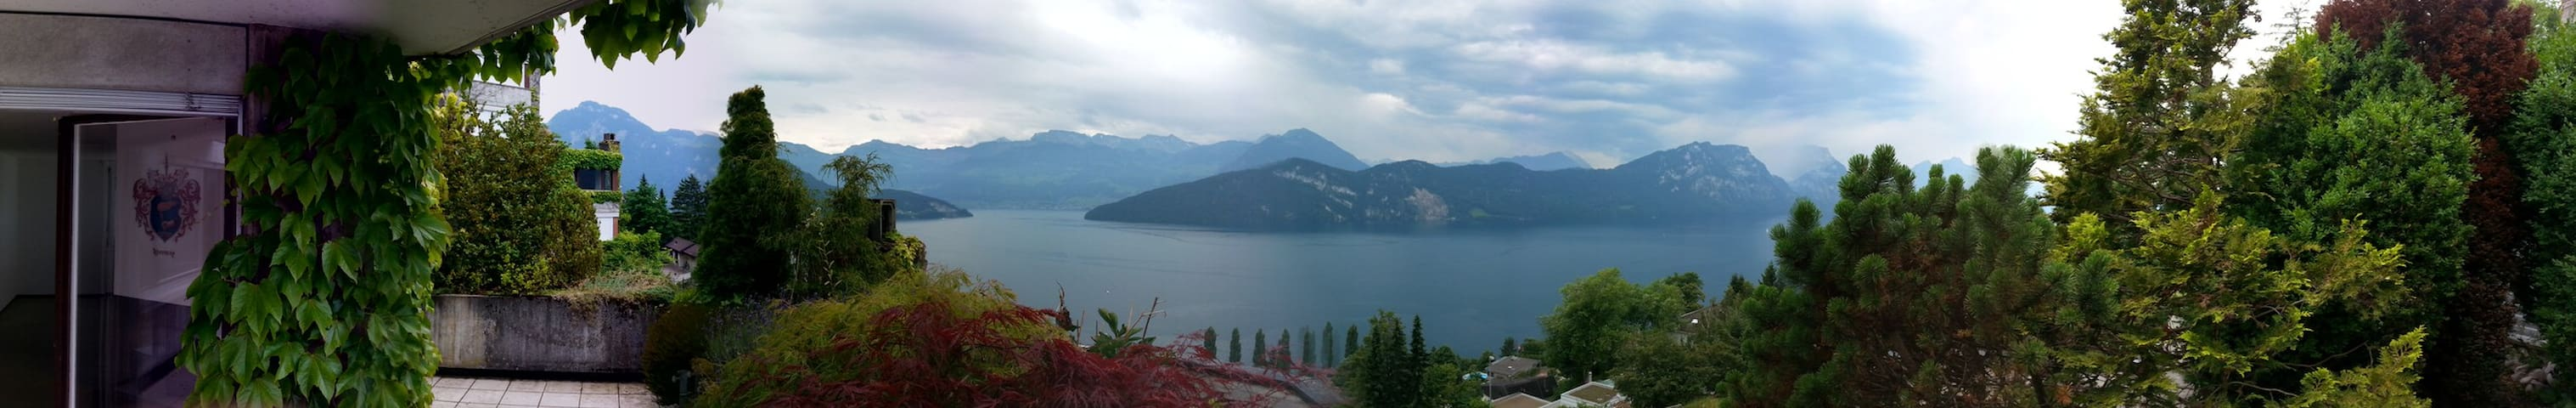 180 Grad volles Panorama auf See und Berge